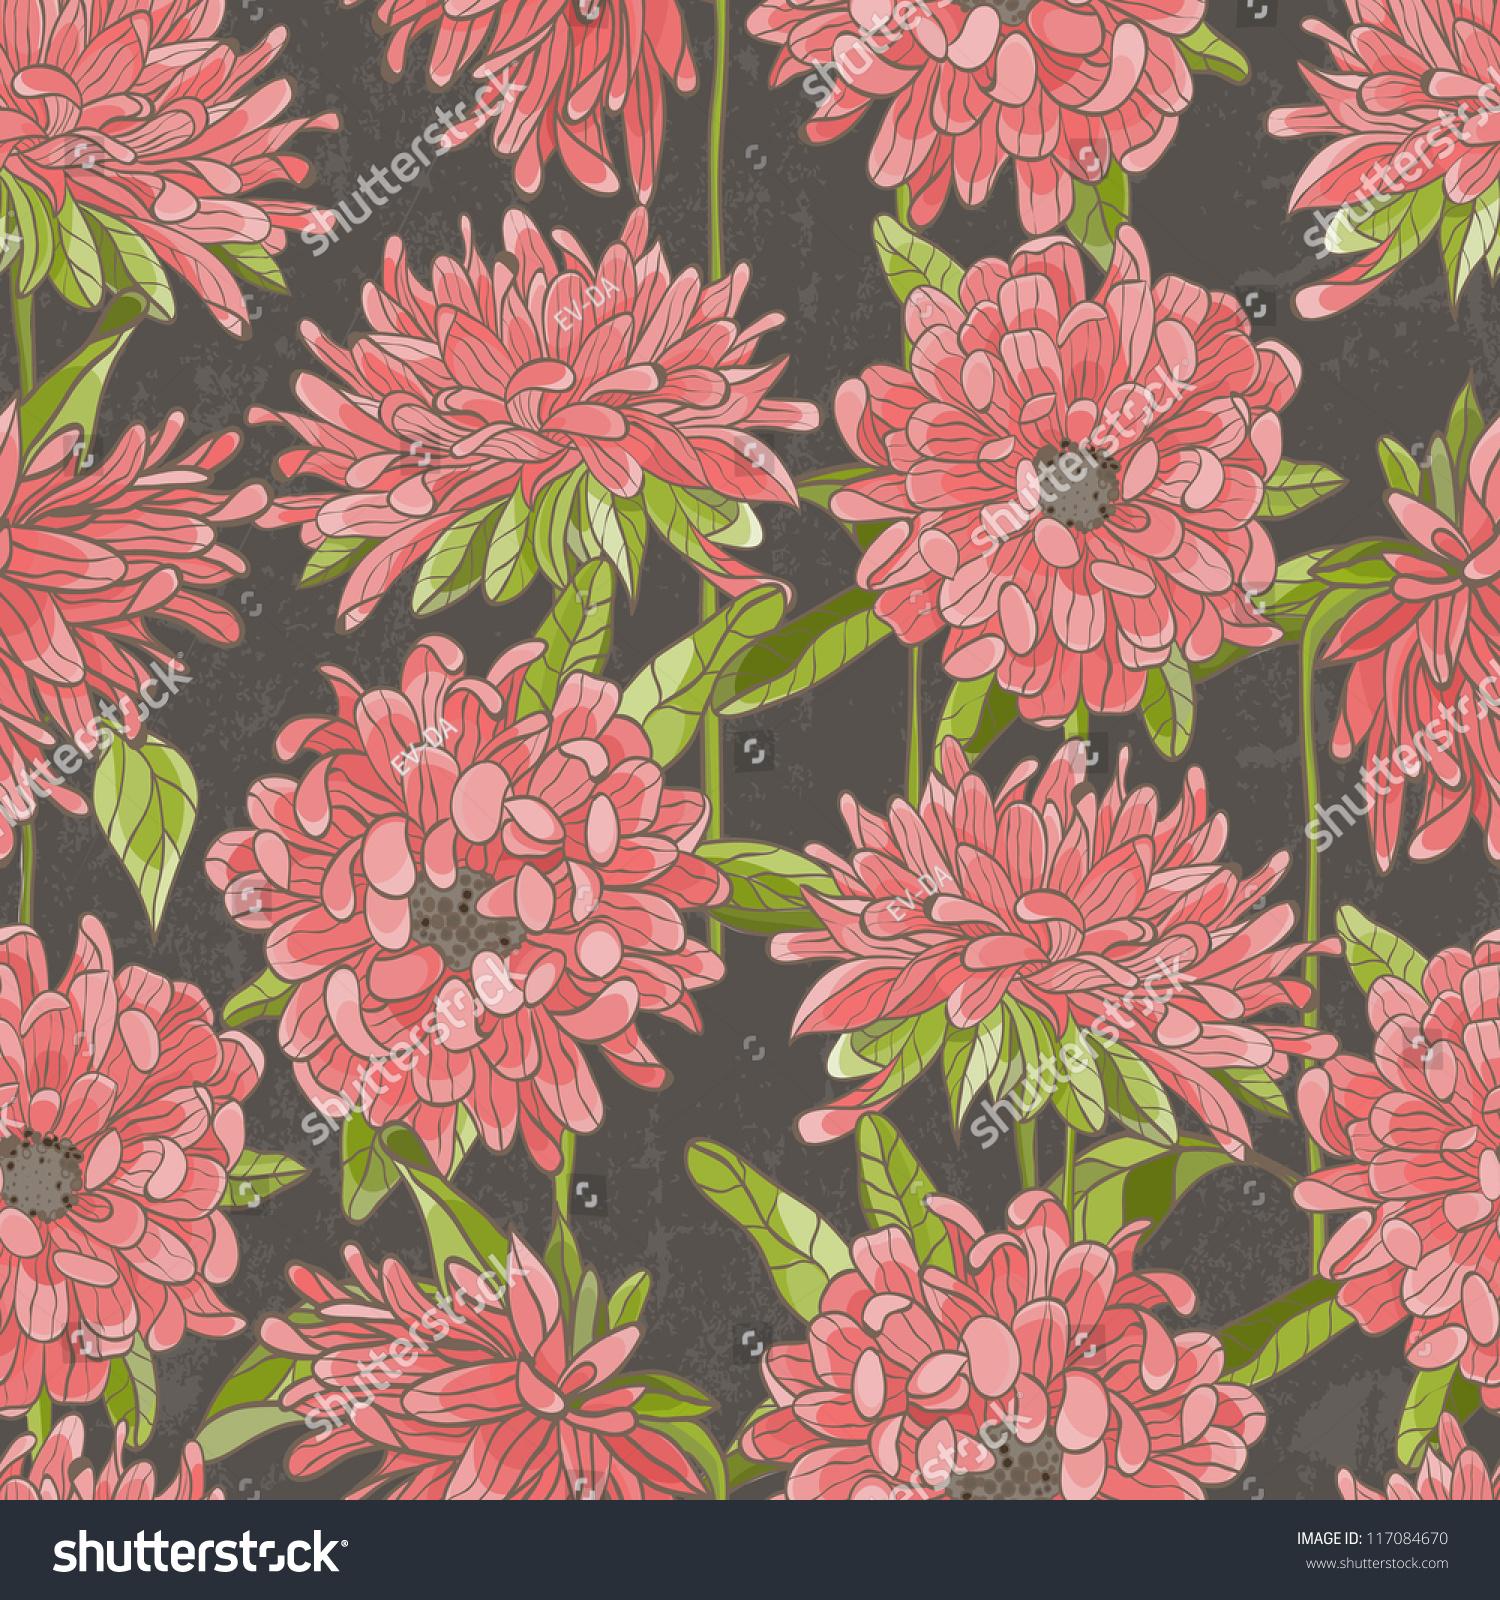 Pink floral seamless vector background floral hrysanthemum seamless - Seamless Floral Pattern With Chrysanthemum Eps 8 Vector Illustration